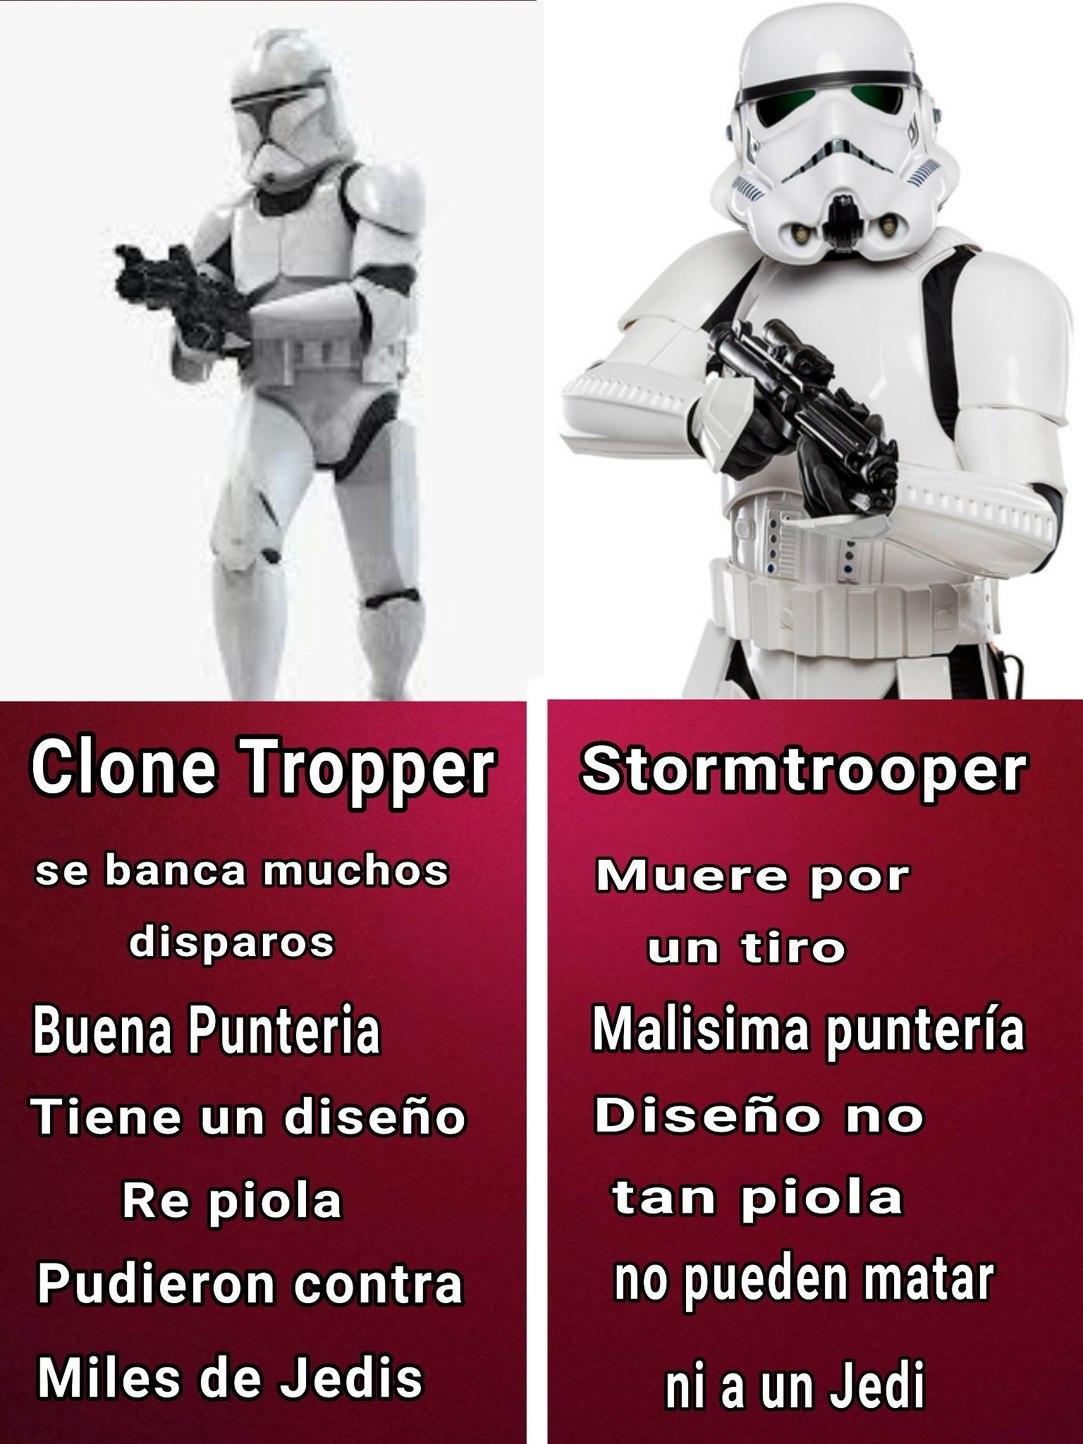 Star Wars - meme